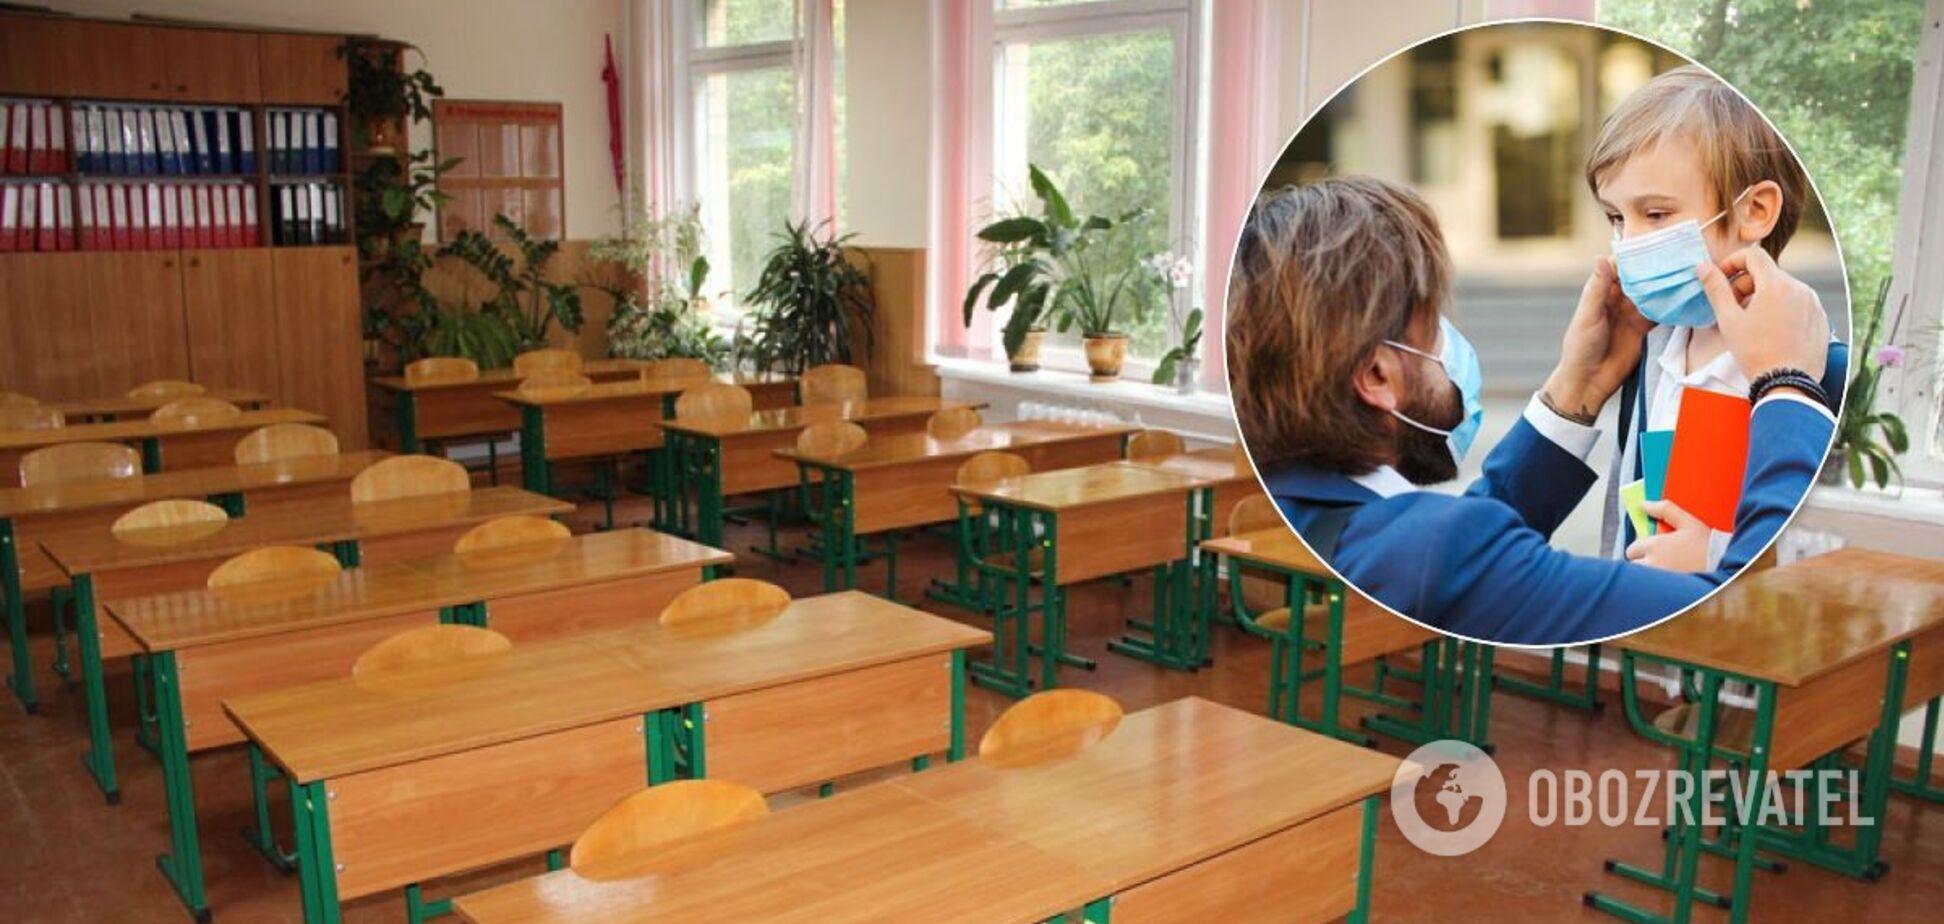 Врач сказал, как снизить риск заражения ребенка COVID-19 в школе